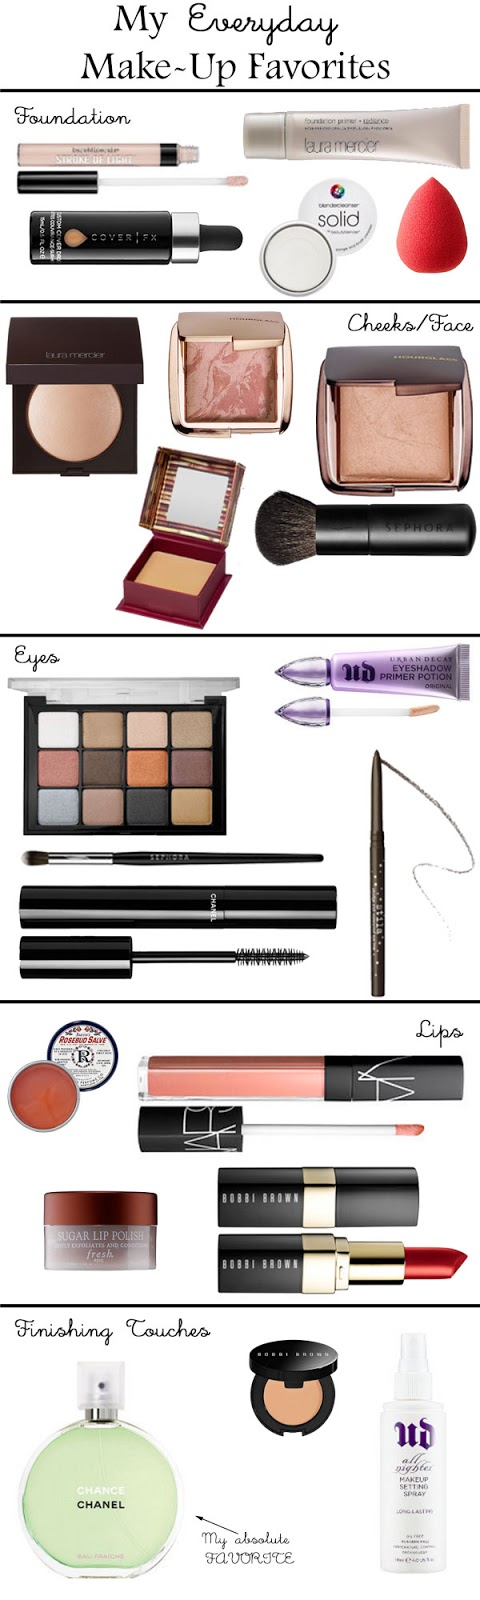 everyday_make_up_favorites